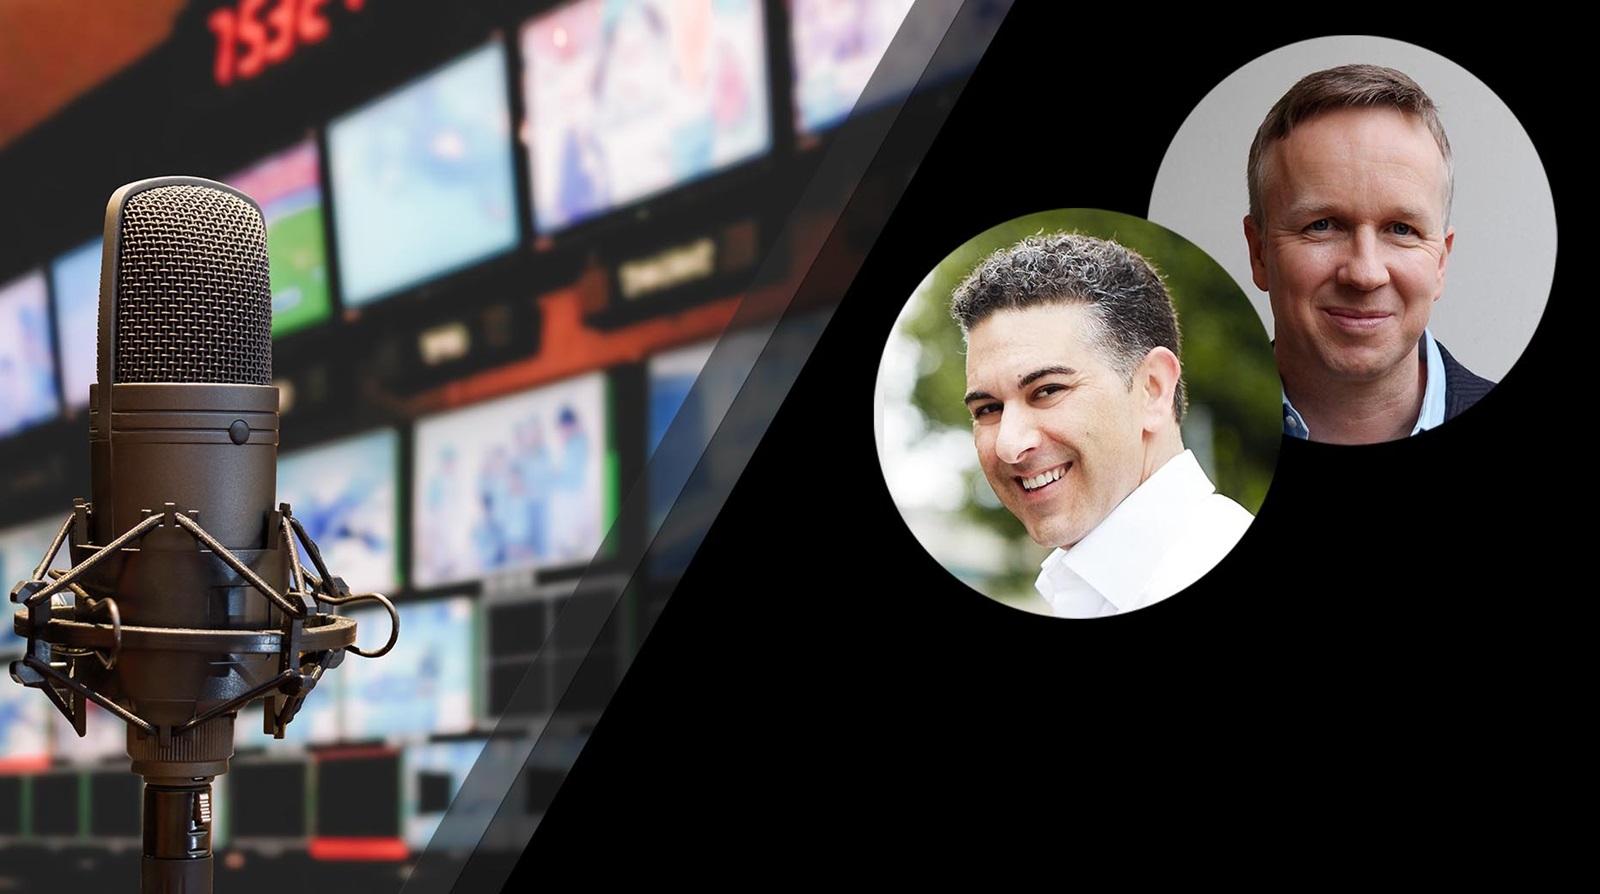 Matt Goldberg and Philip Bromwell on the Making the Media podcast